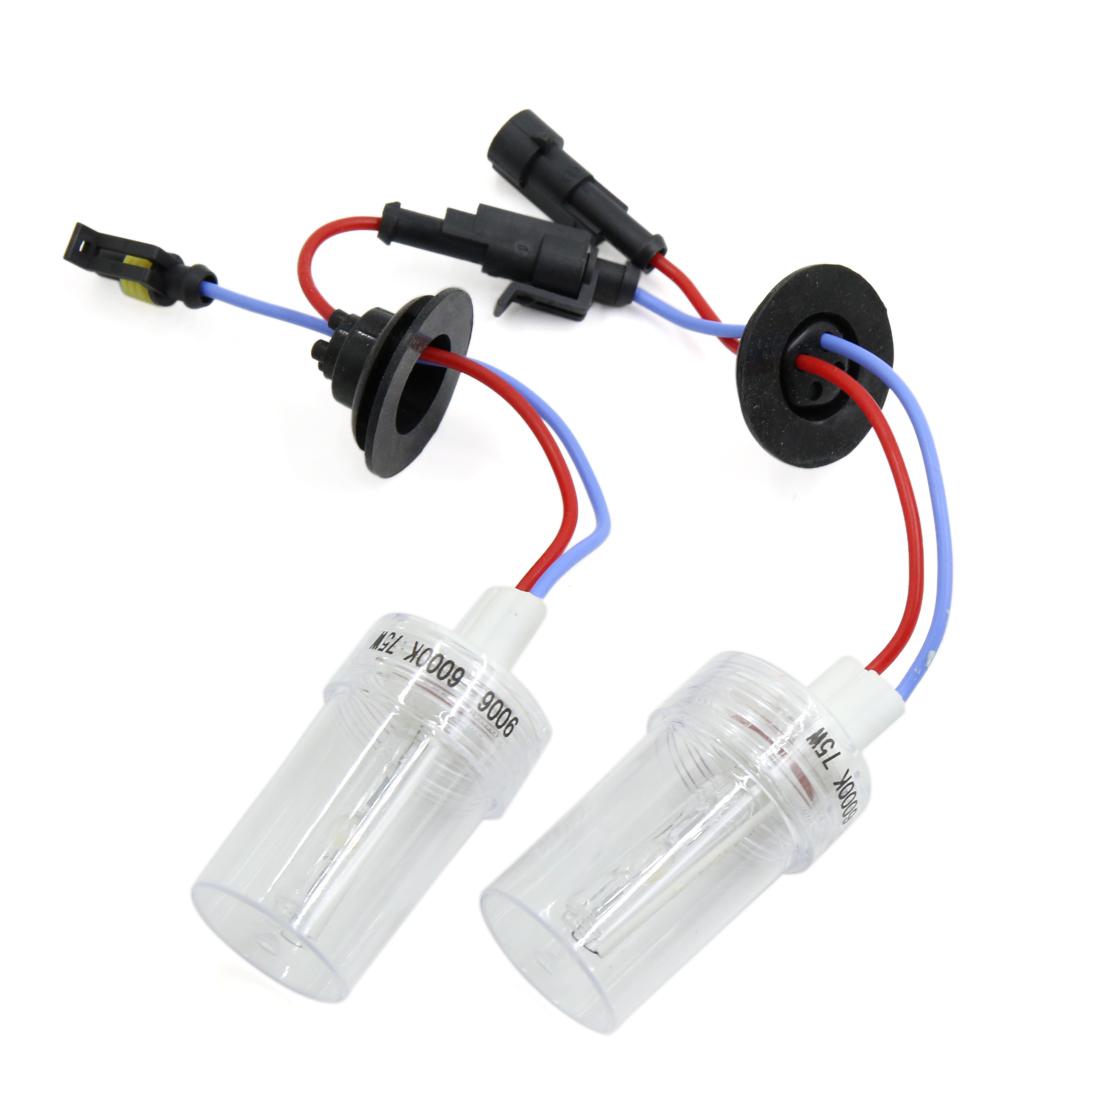 2PCS 6000K 75W 9006 HB4 HID Xenon Headlamp Lamp Light Bulbs for Auto Car